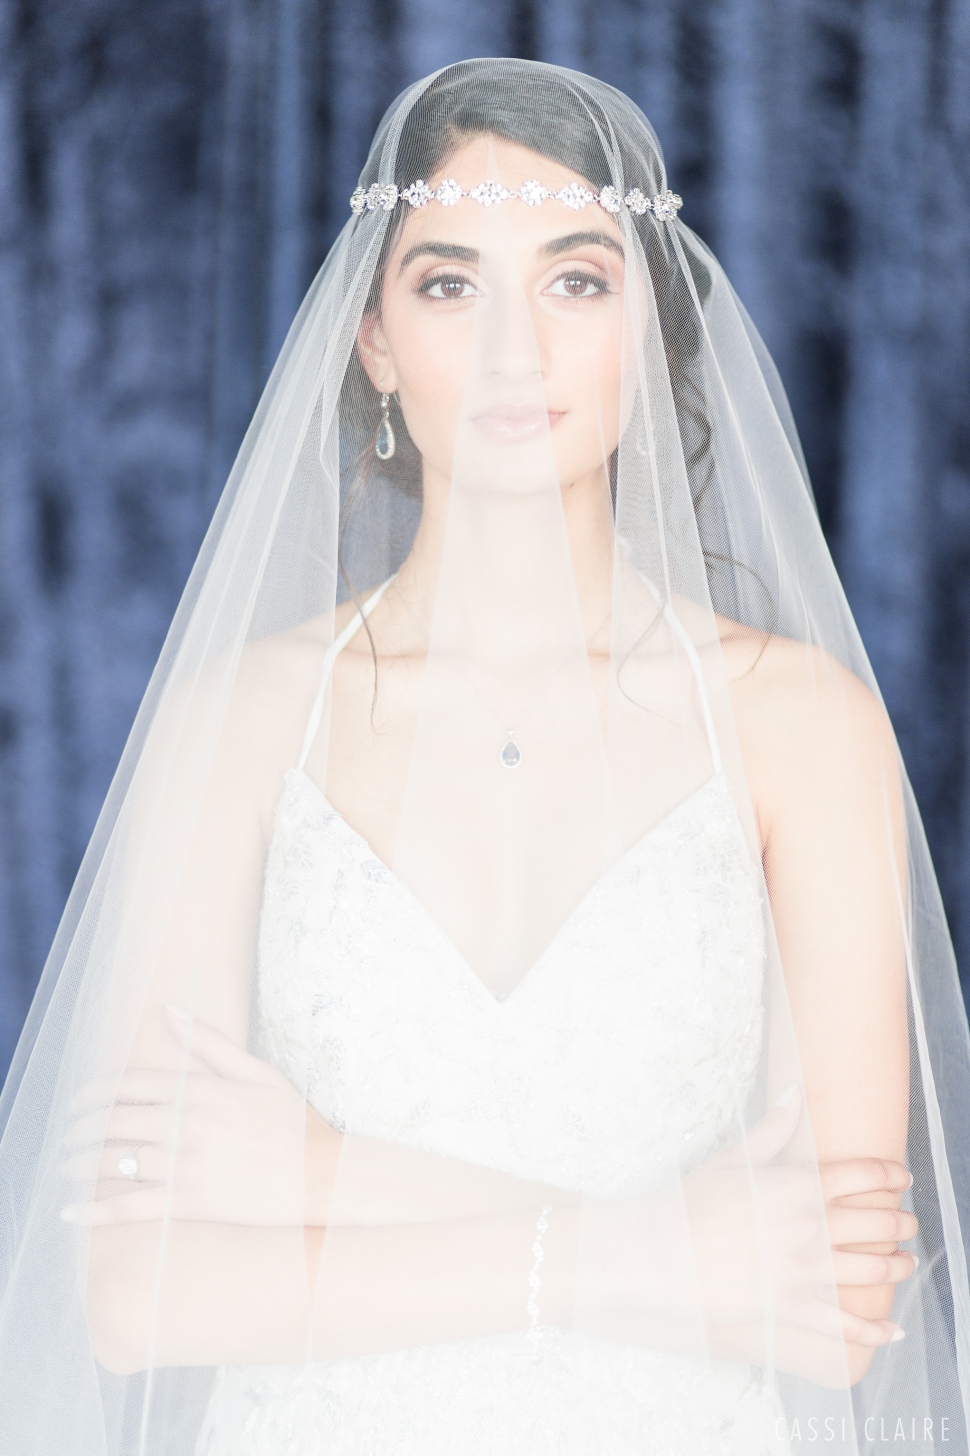 Blue-Monotone-Wedding_CassiClaire_25.jpg